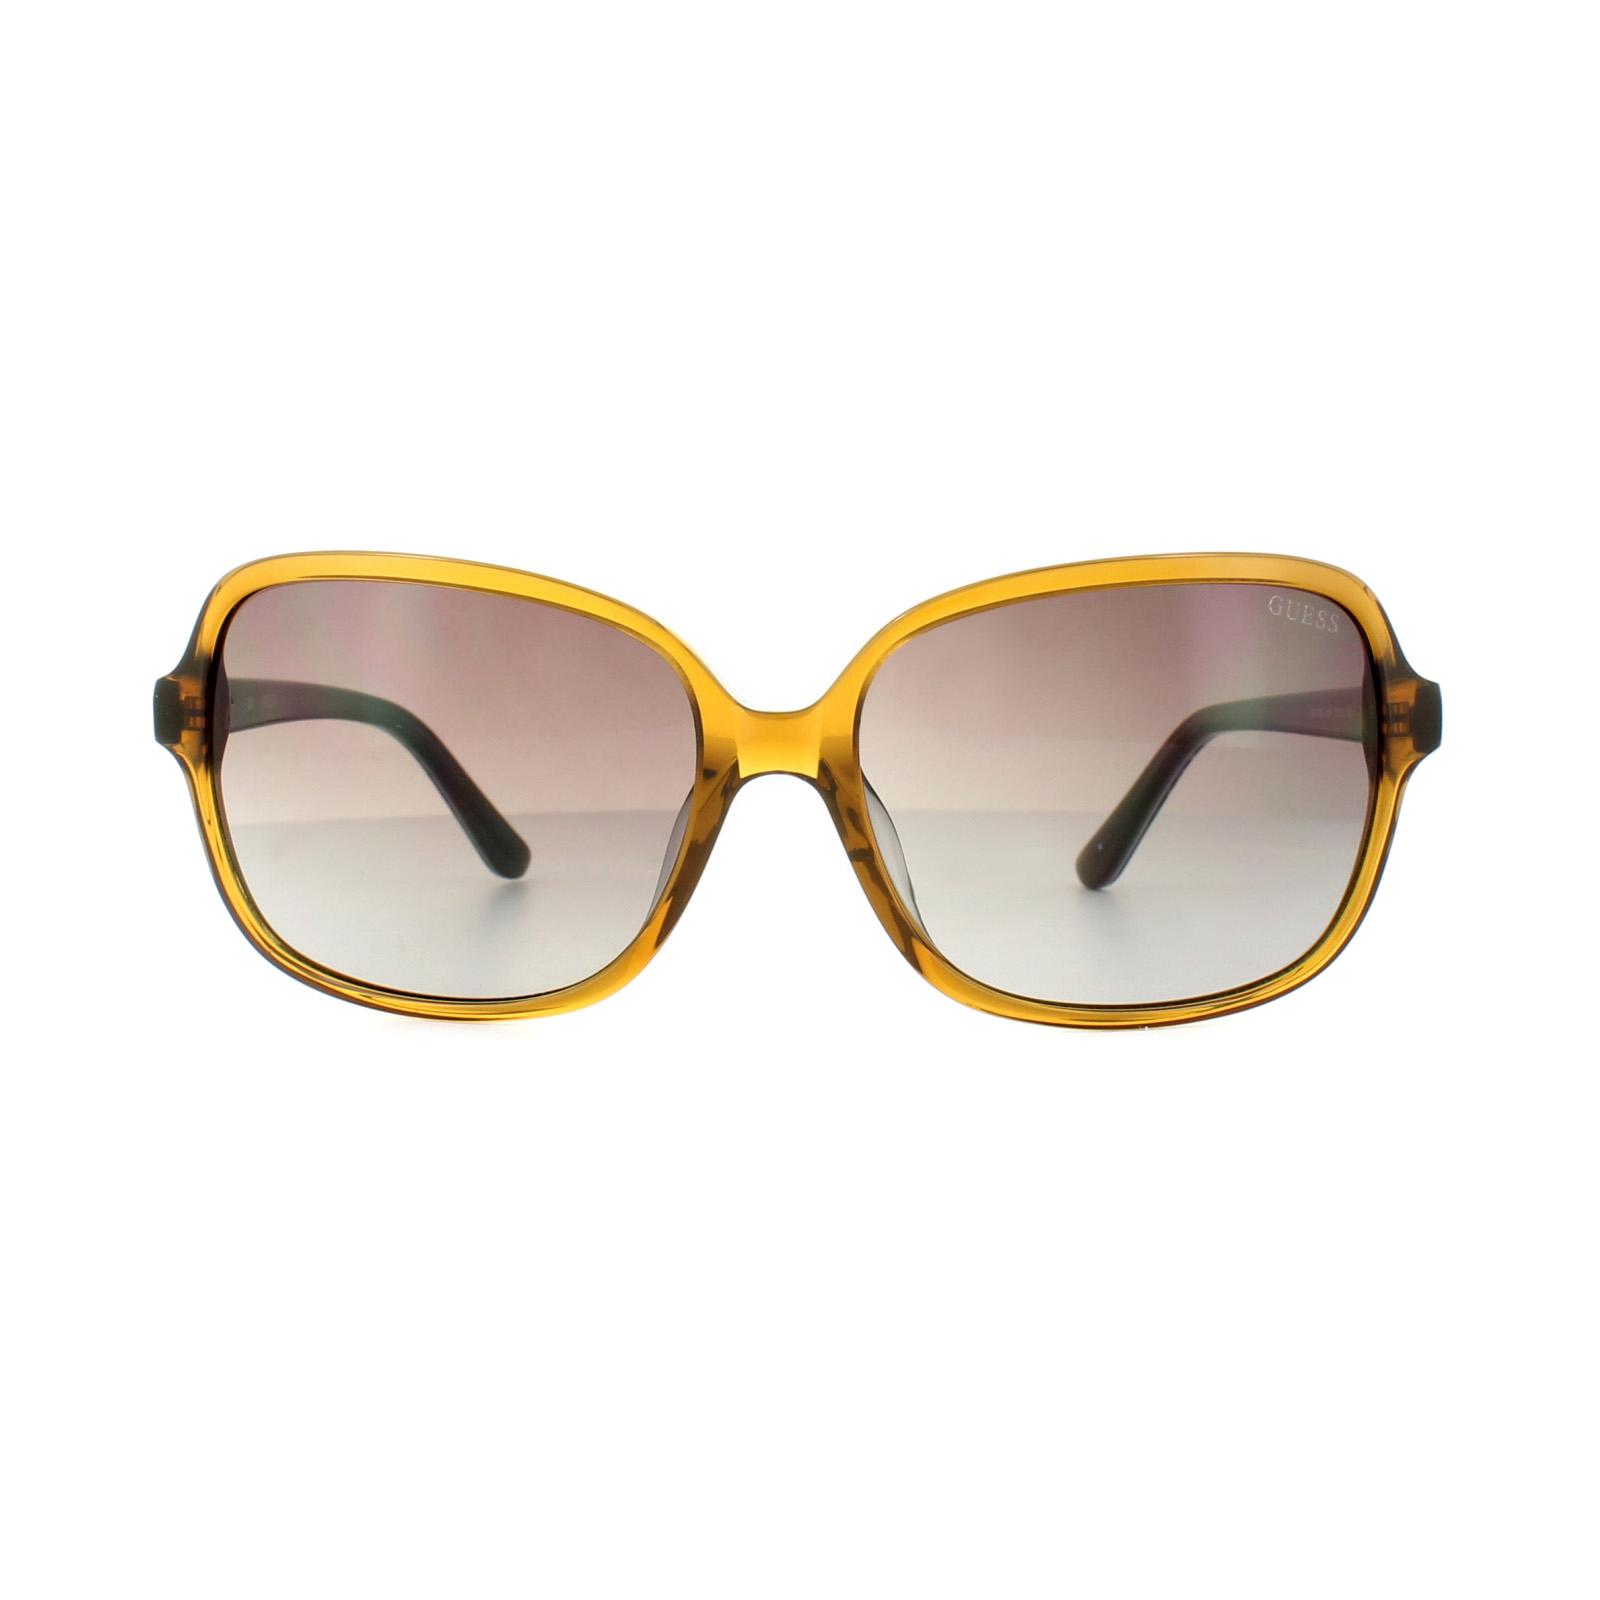 531f0539370d9 Sentinel Guess Sunglasses GU7382 45F Caramel Coloured Fantasy Brown Gradient